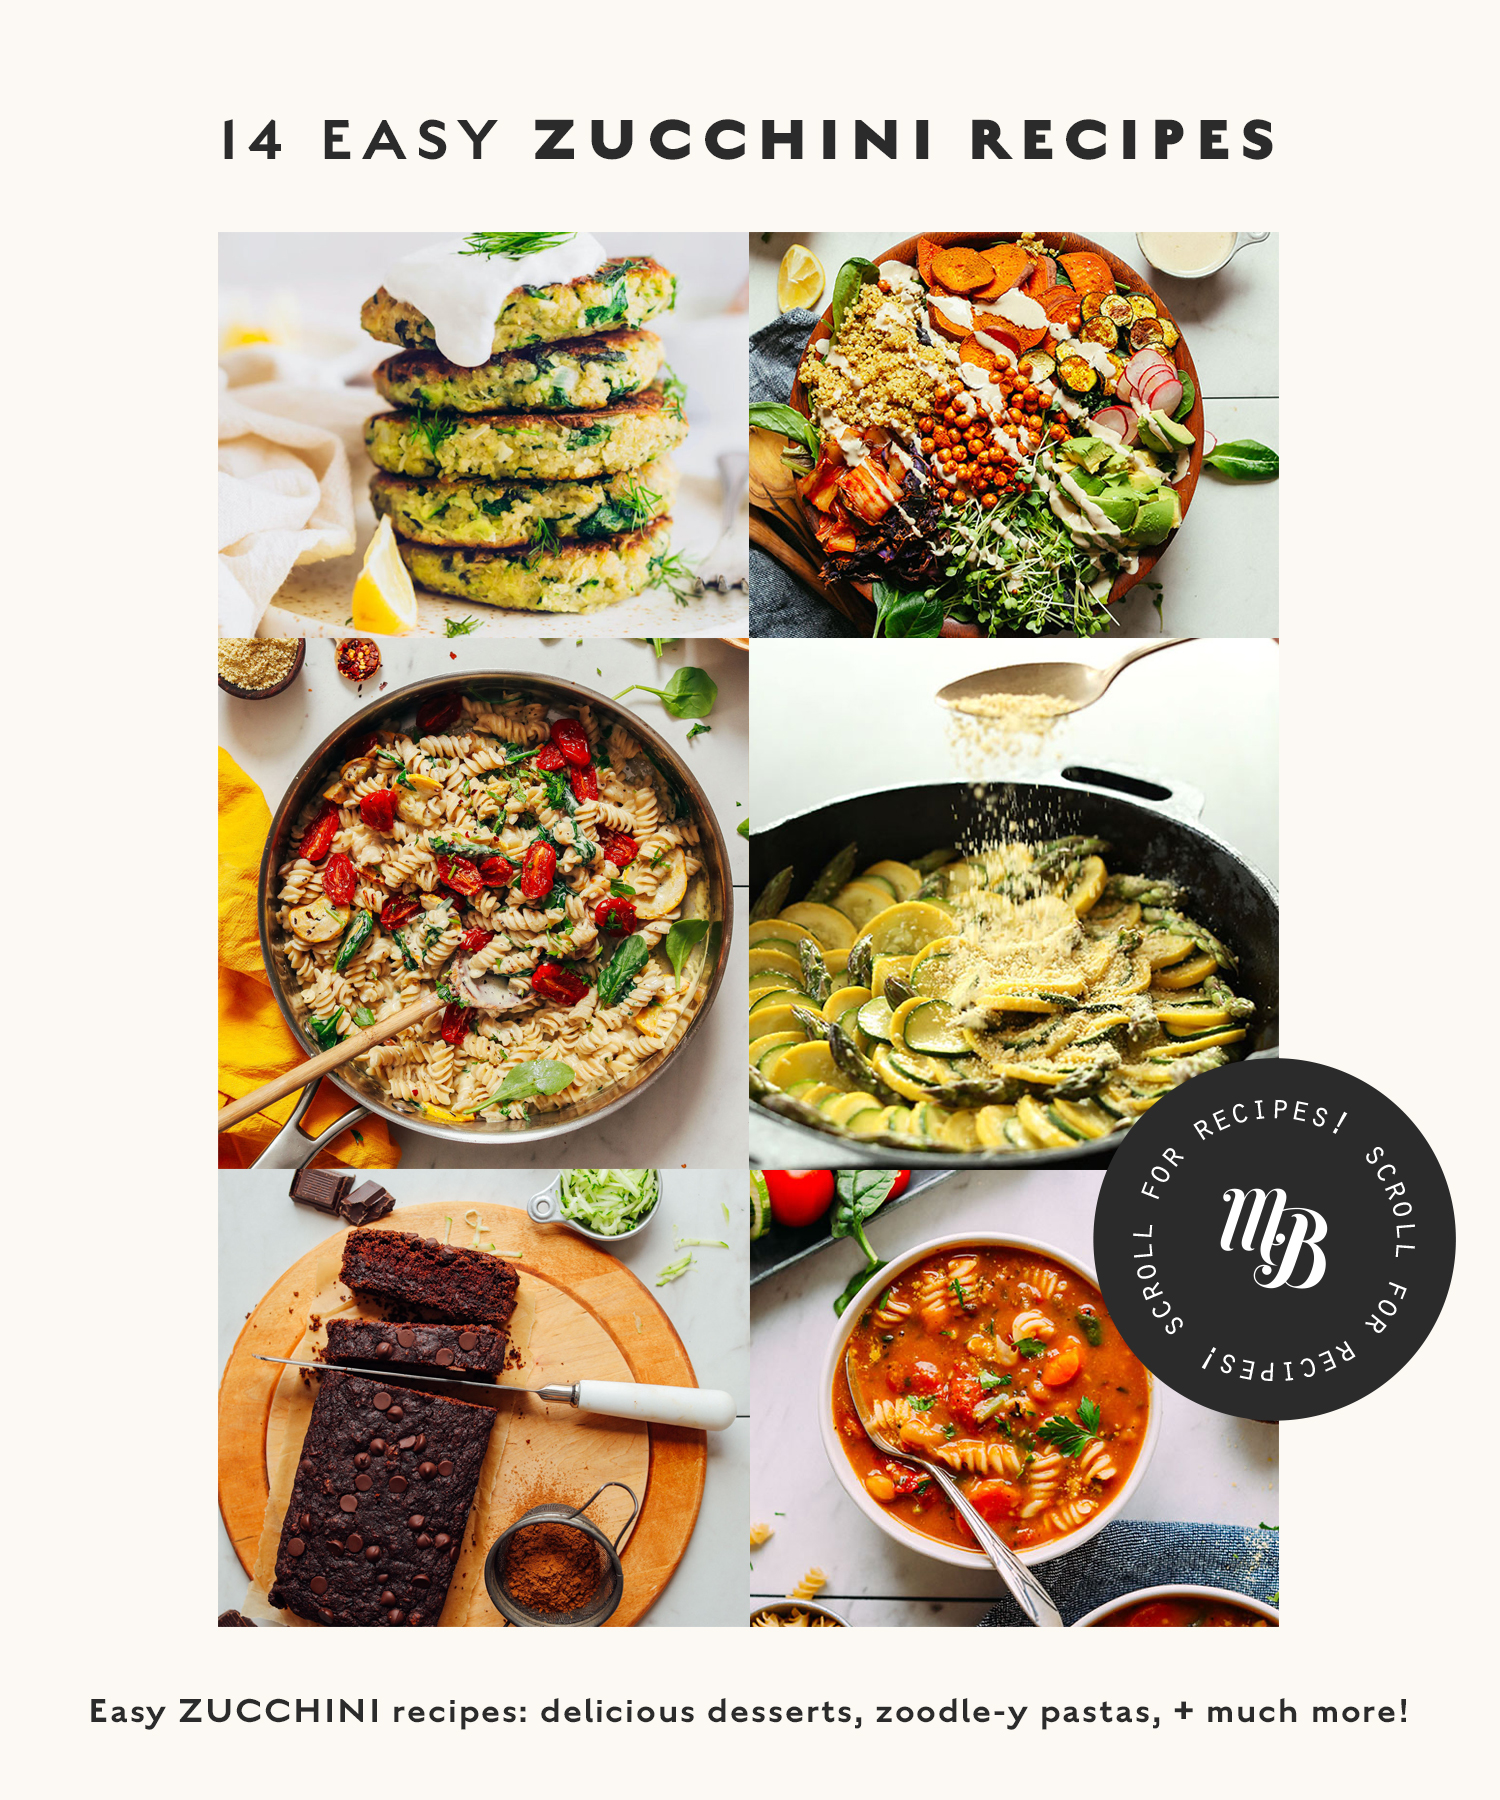 Assortment of easy zucchini recipes